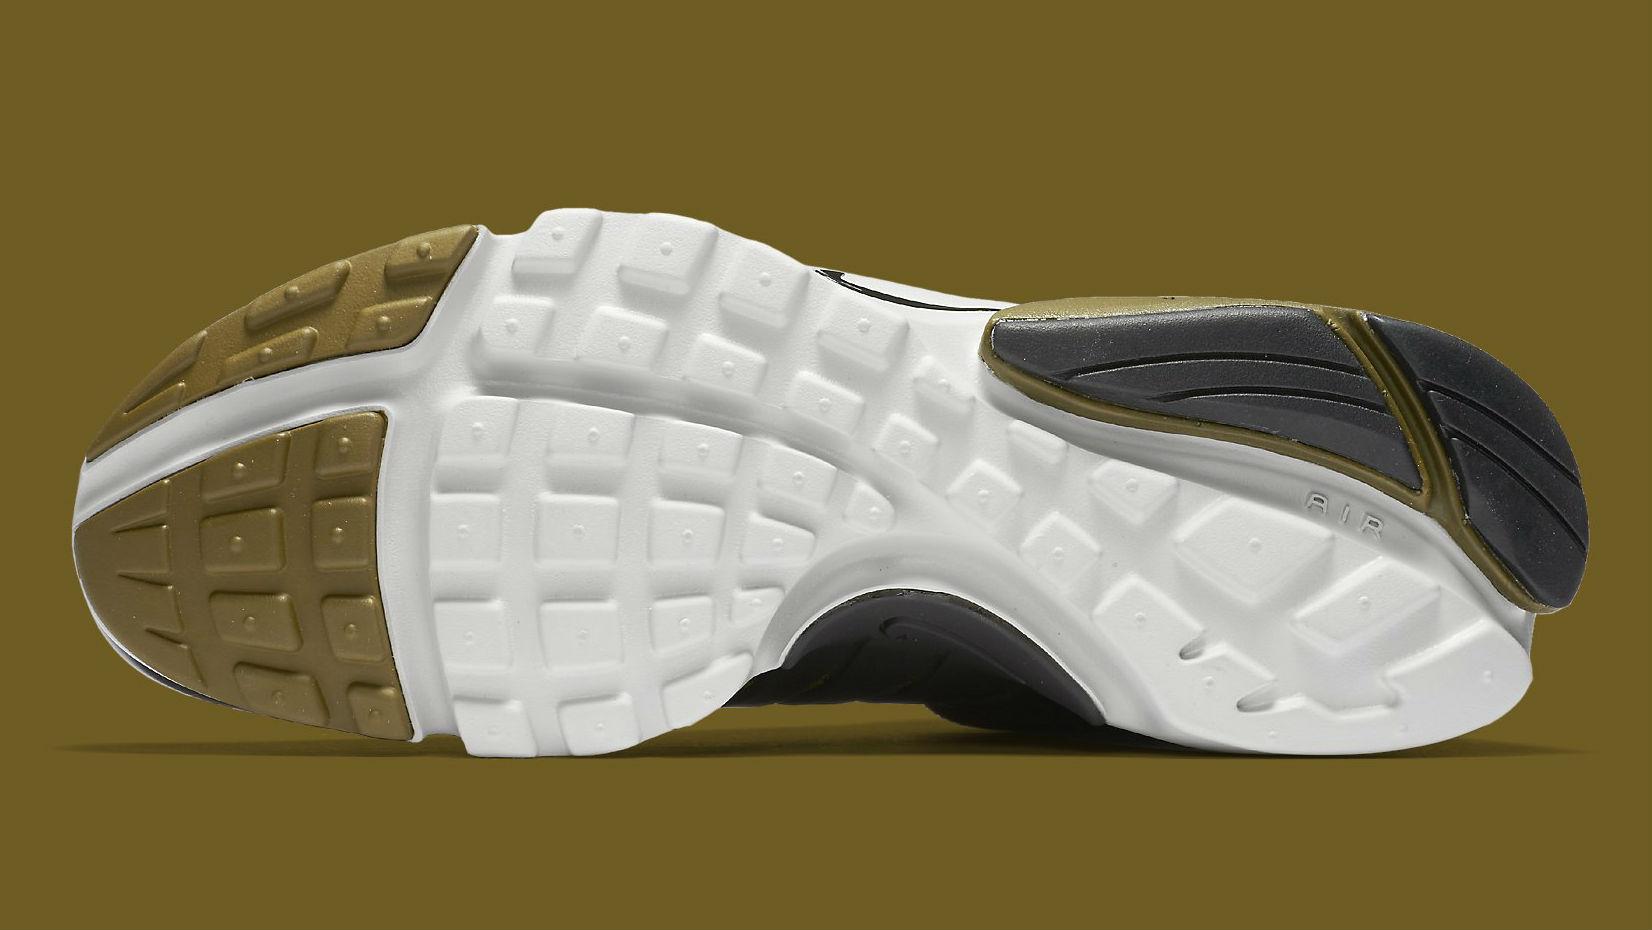 Nike Air Presto Ultra Flyknit Olive Flak Sole 835570-300